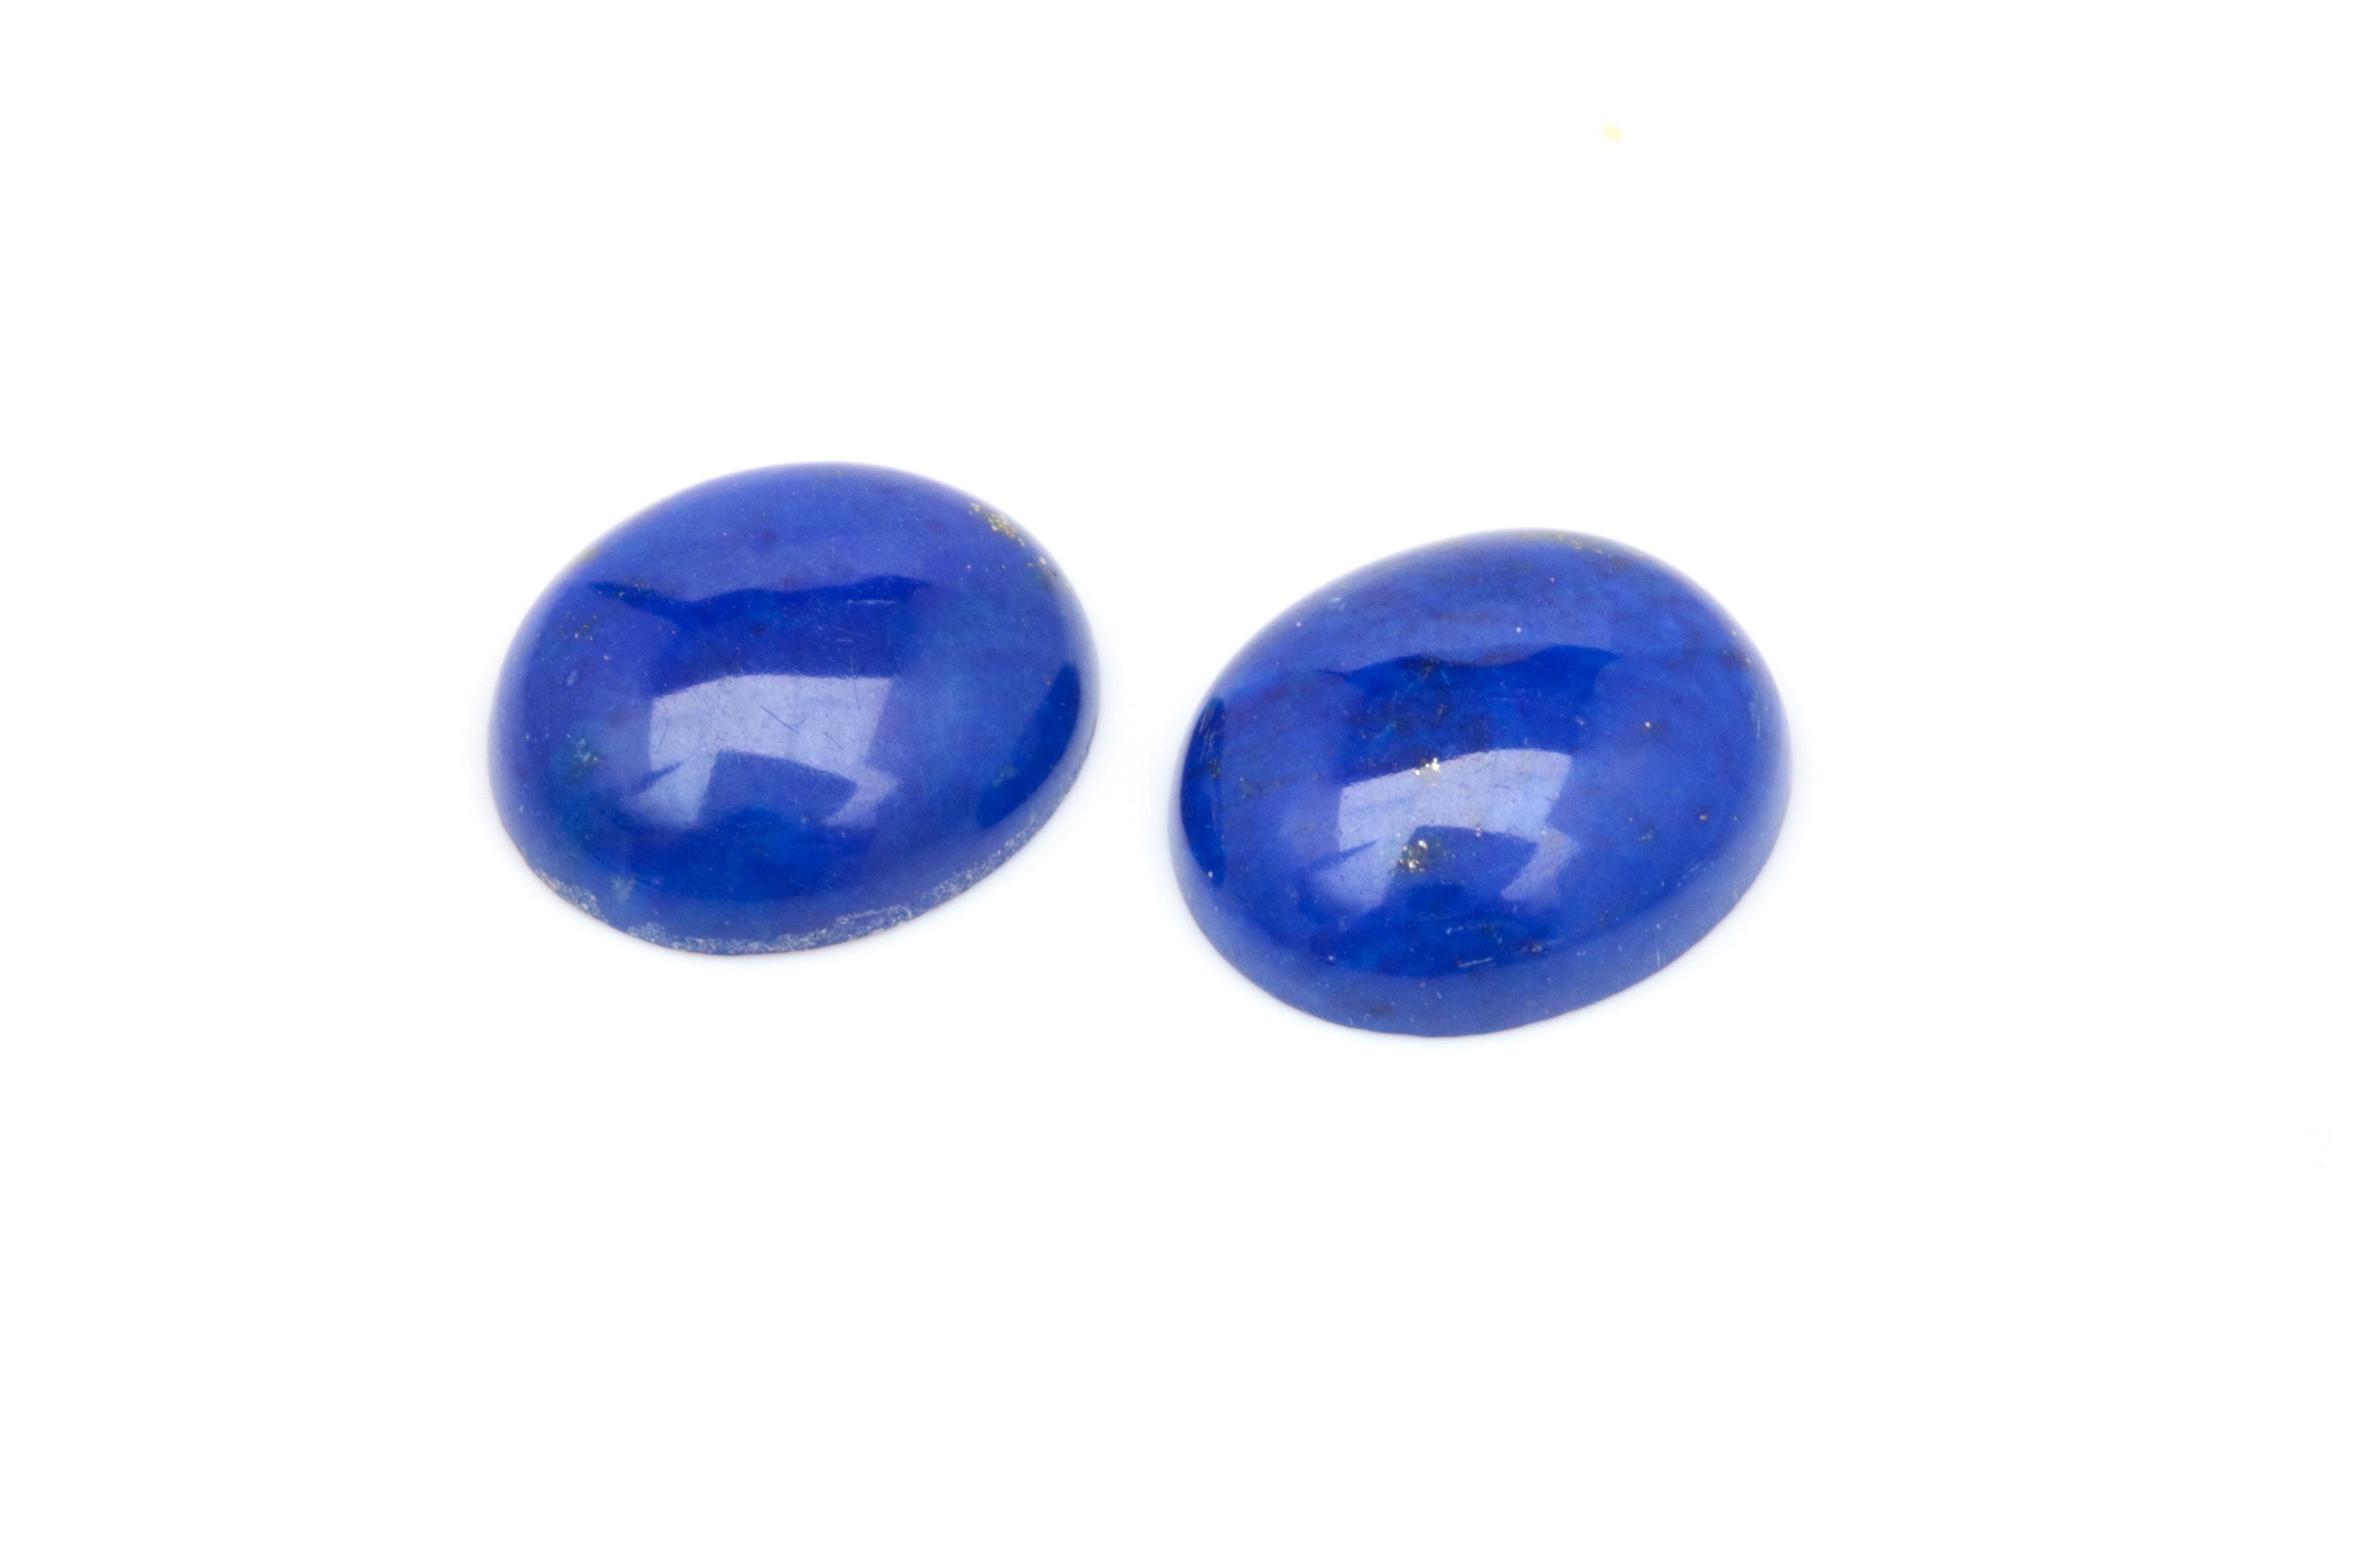 Two Loose Lapis Lazuli Cabochons